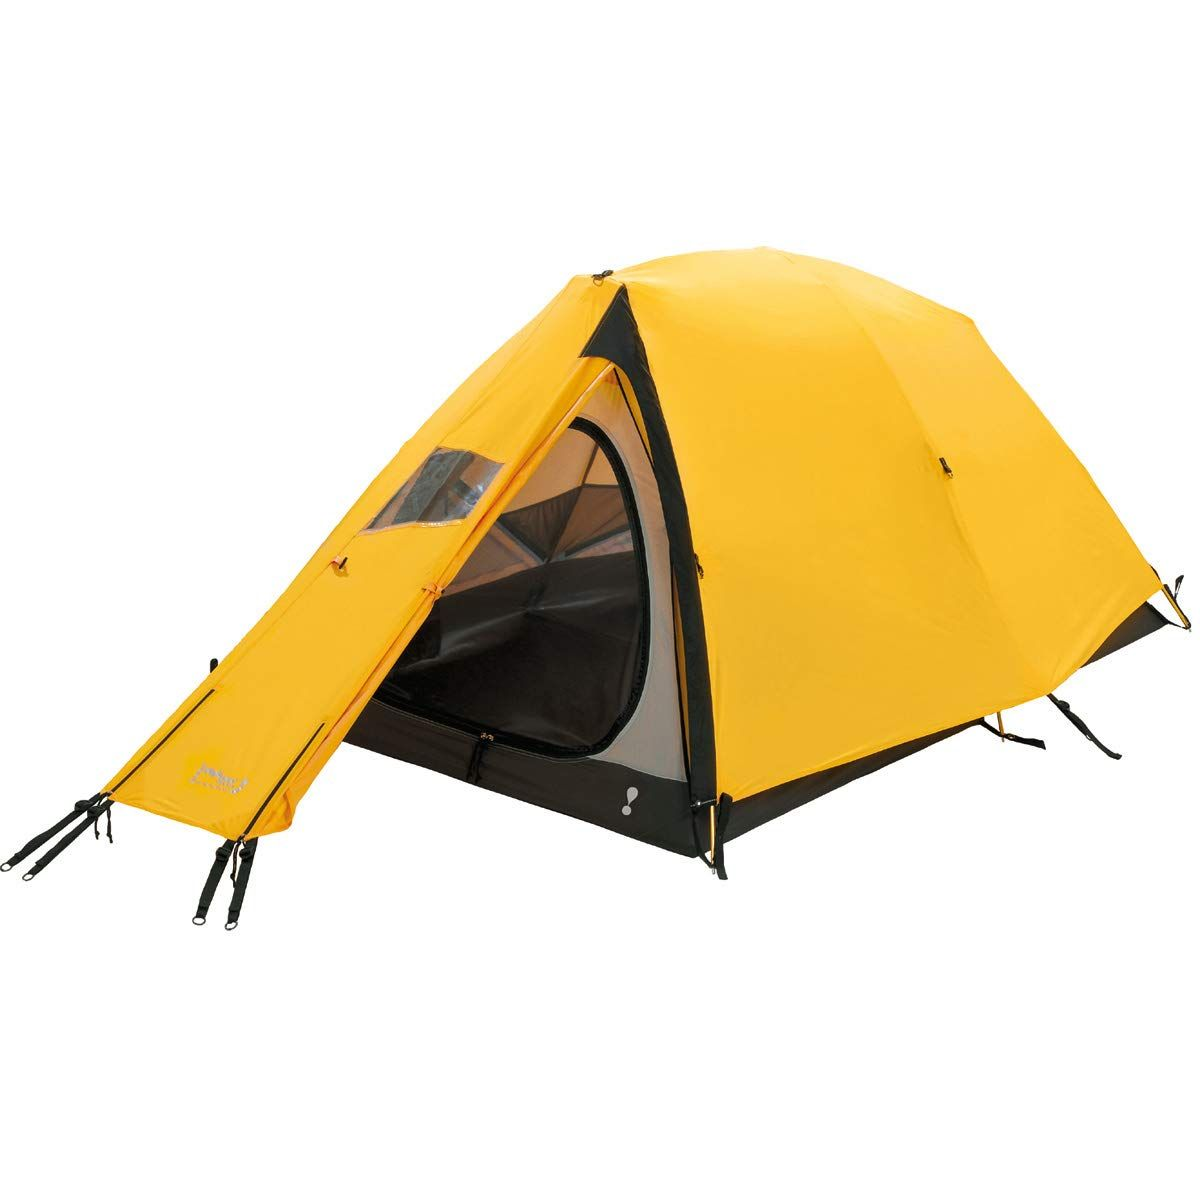 Black Diamond Fitzroy Tent: Amazon.co